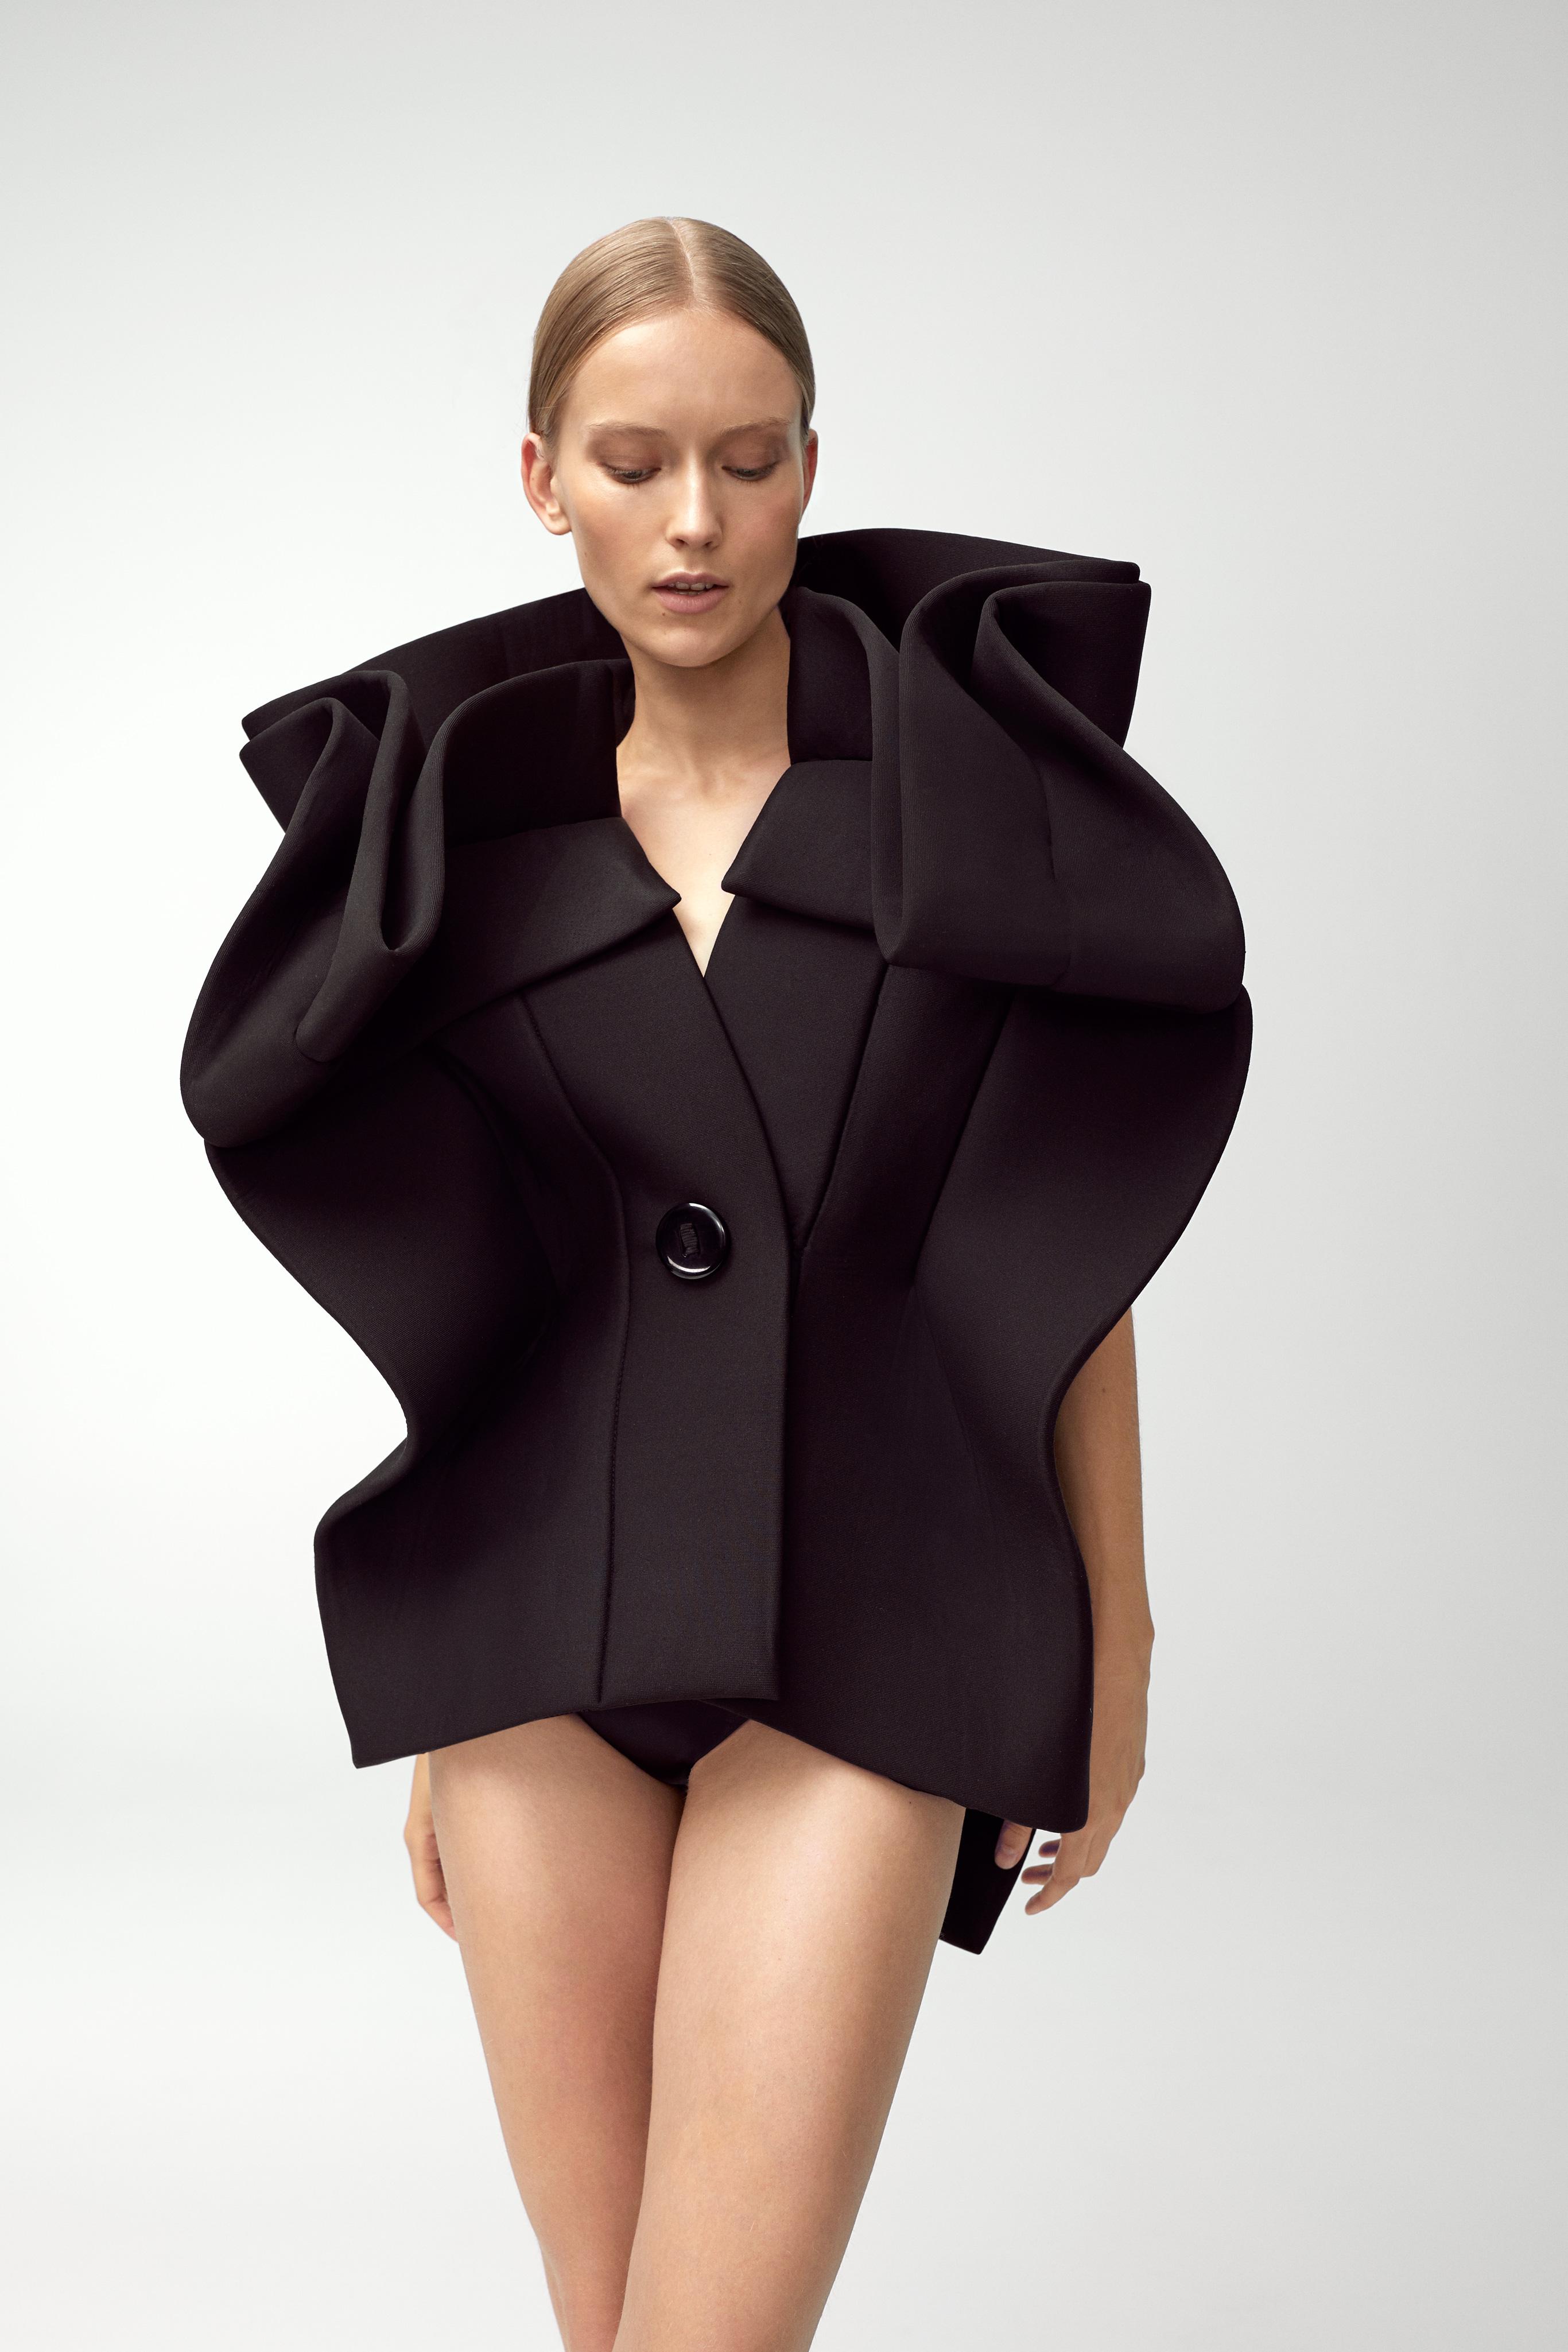 Celio Jacket SS2021 Image: Amanda Pratt Styling: Dimeji Alara